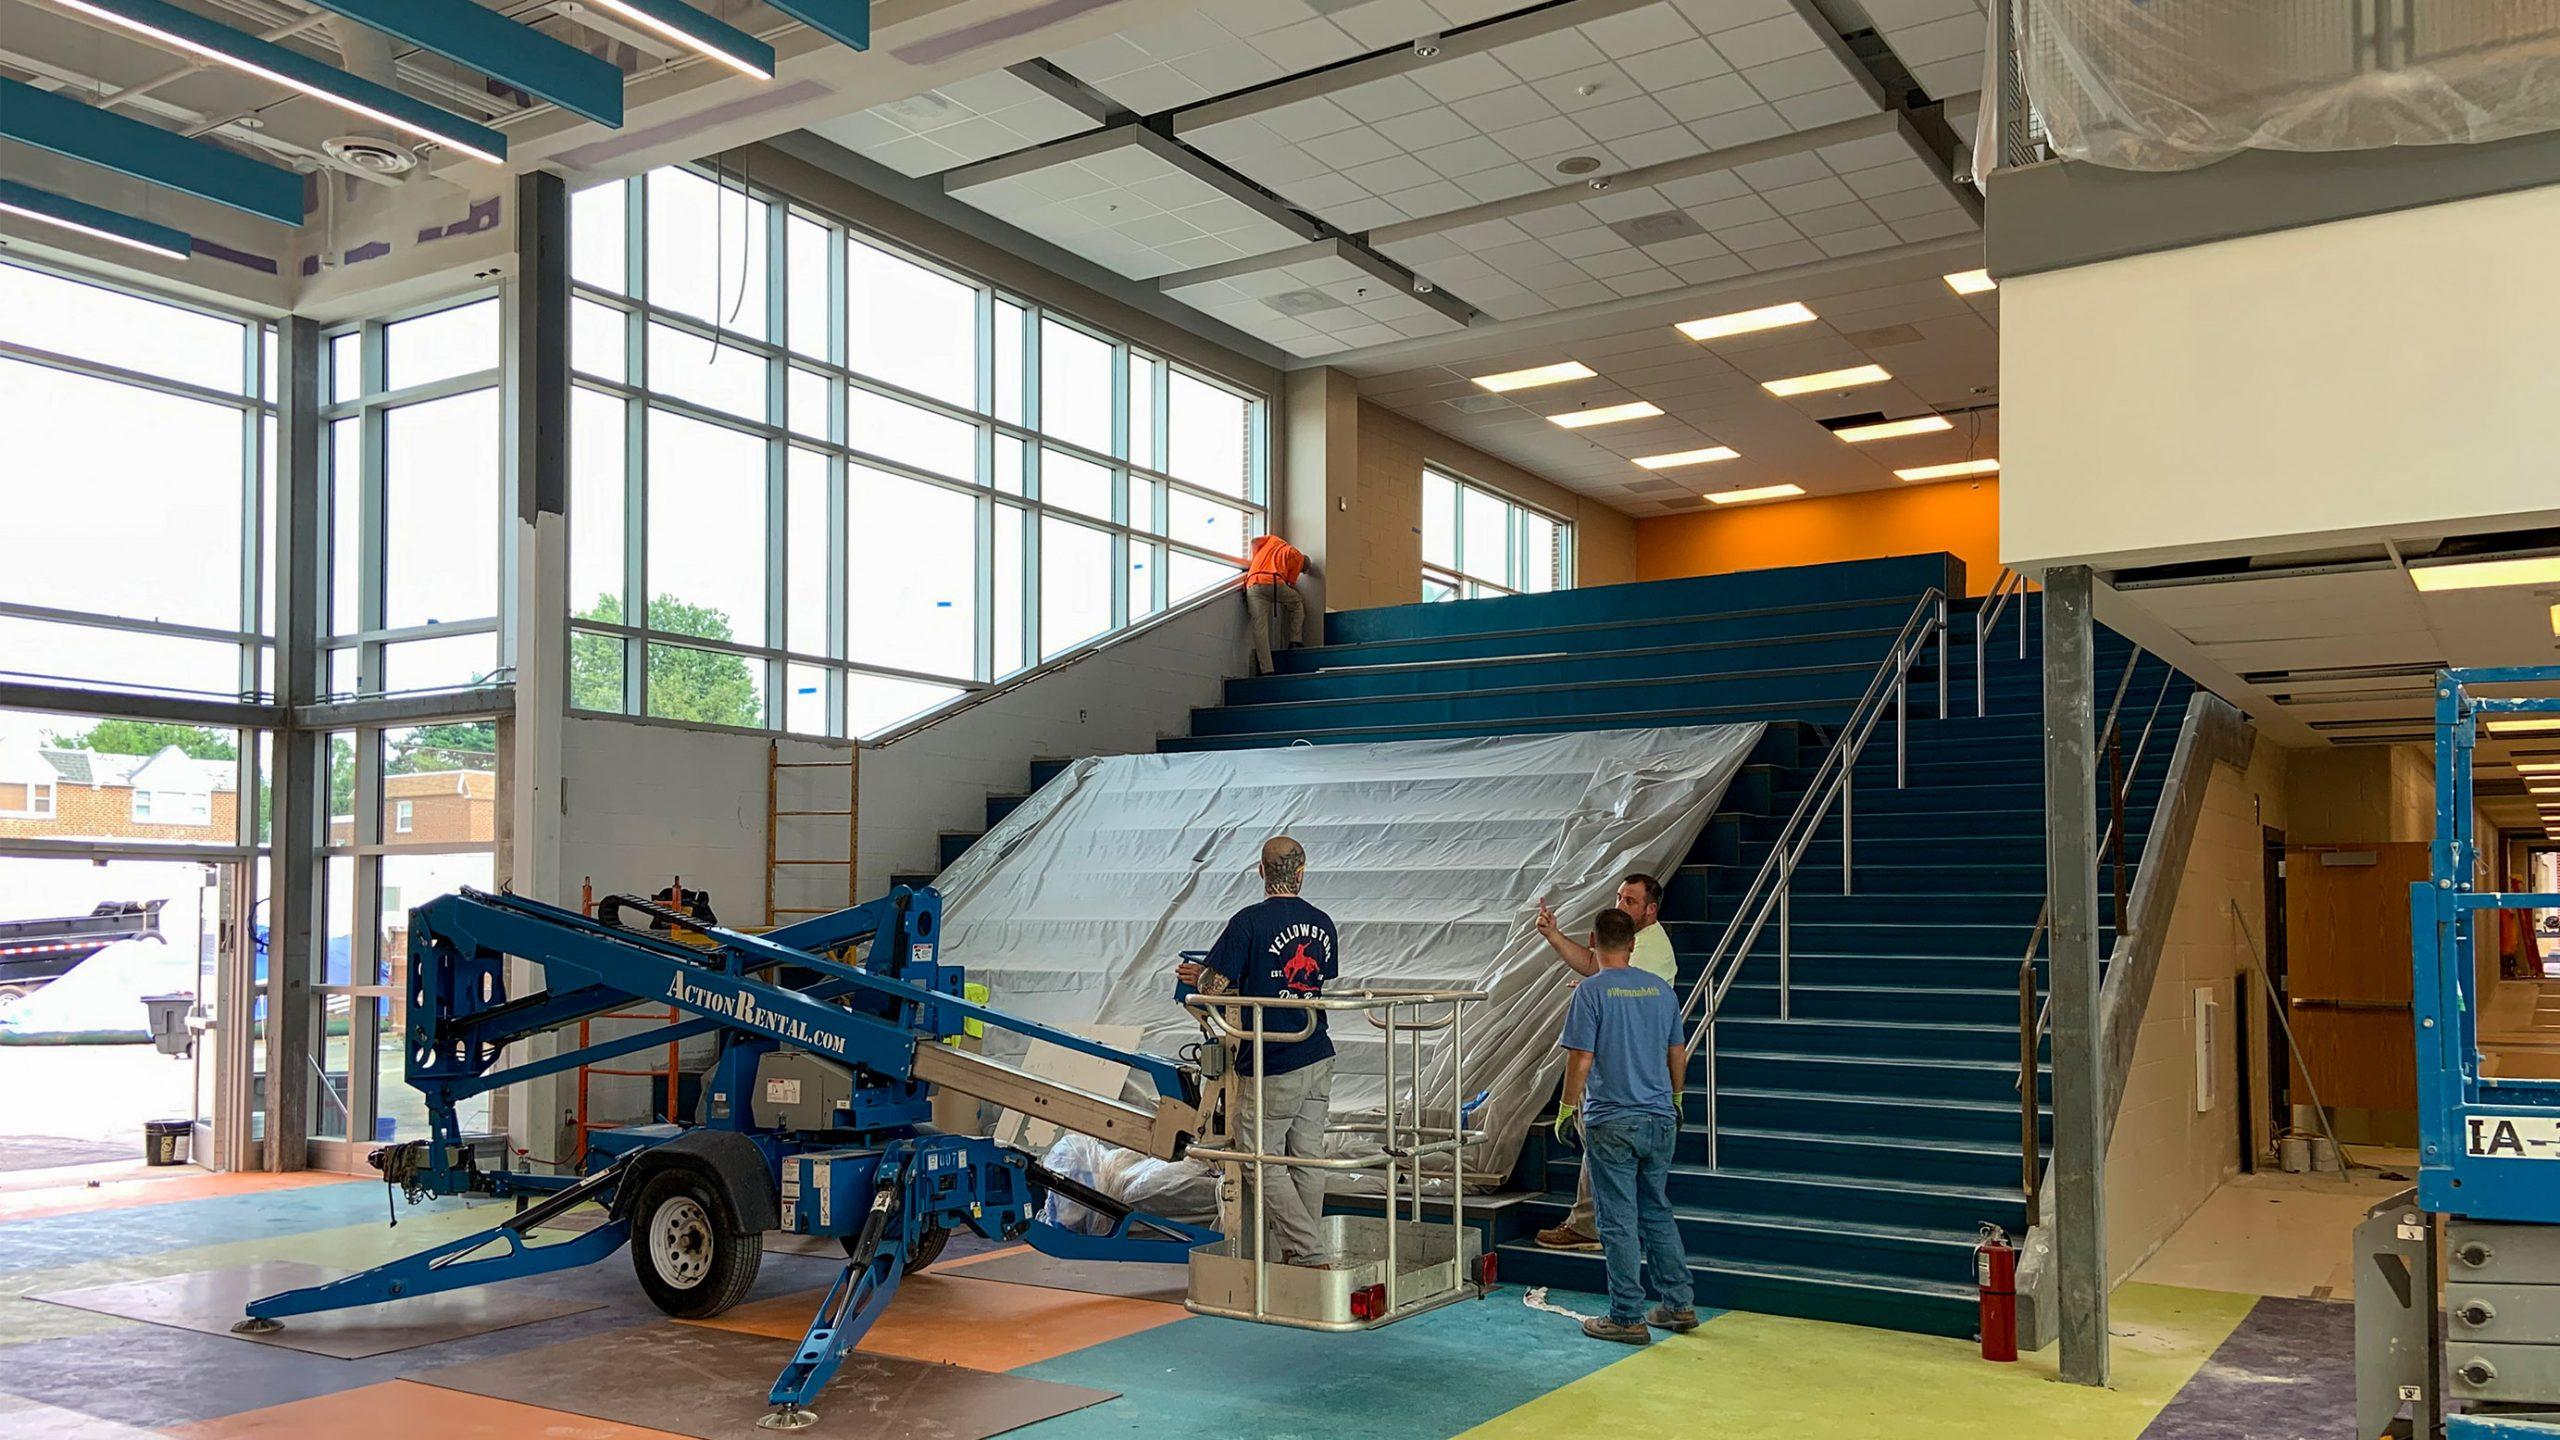 2-Anne-Frank-Elementary-School_School-District-of-Philadelphia_SCHRADERGROUP_Summer-Construction-Progress